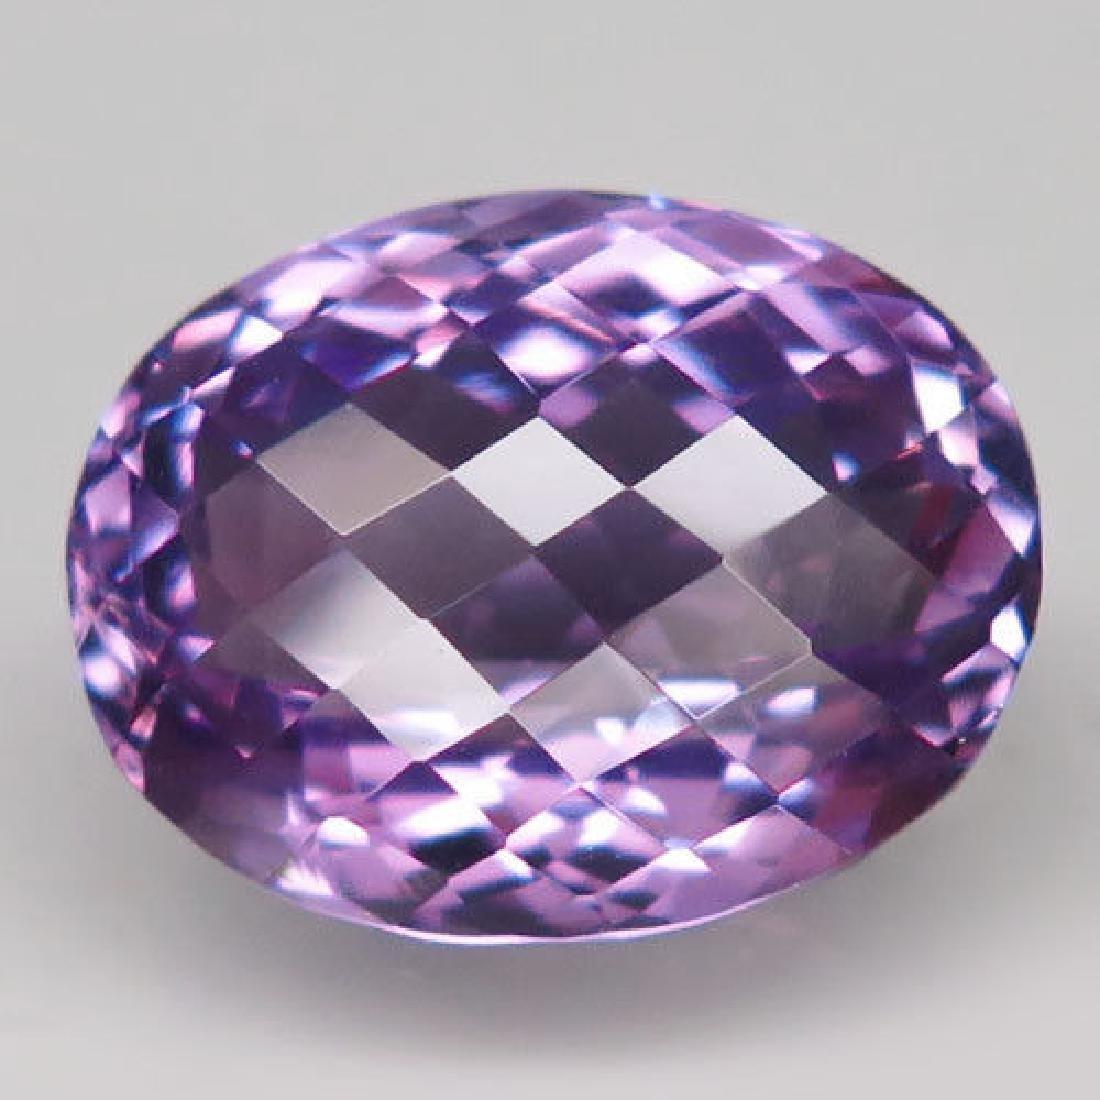 9.68ct 100%Natural Rich Purple Amethyst Unheated Brazil